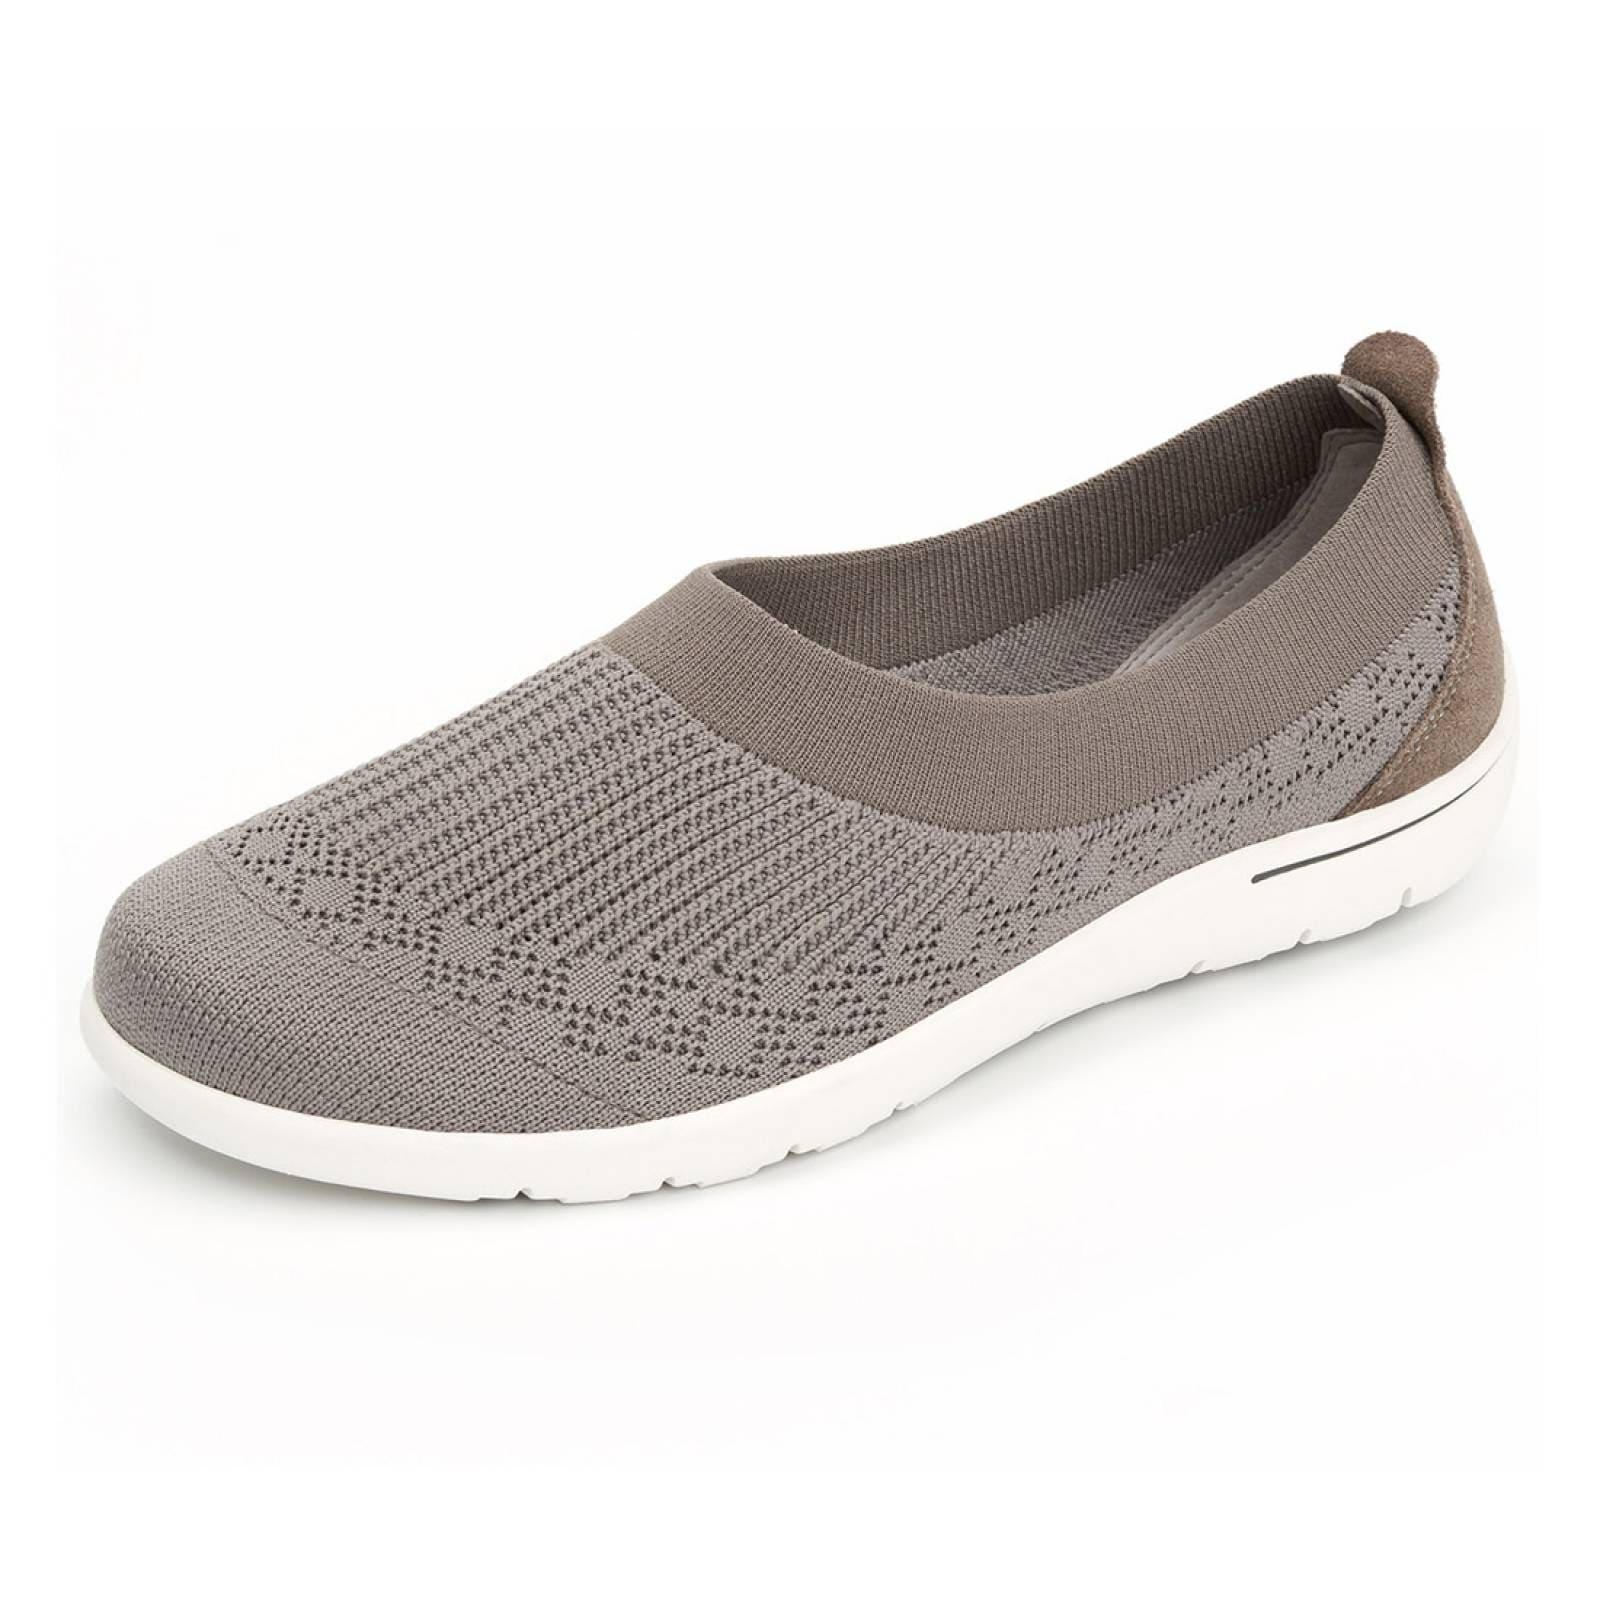 d39b012f Zapato flexi casual dama mujer cómodo moderno gris